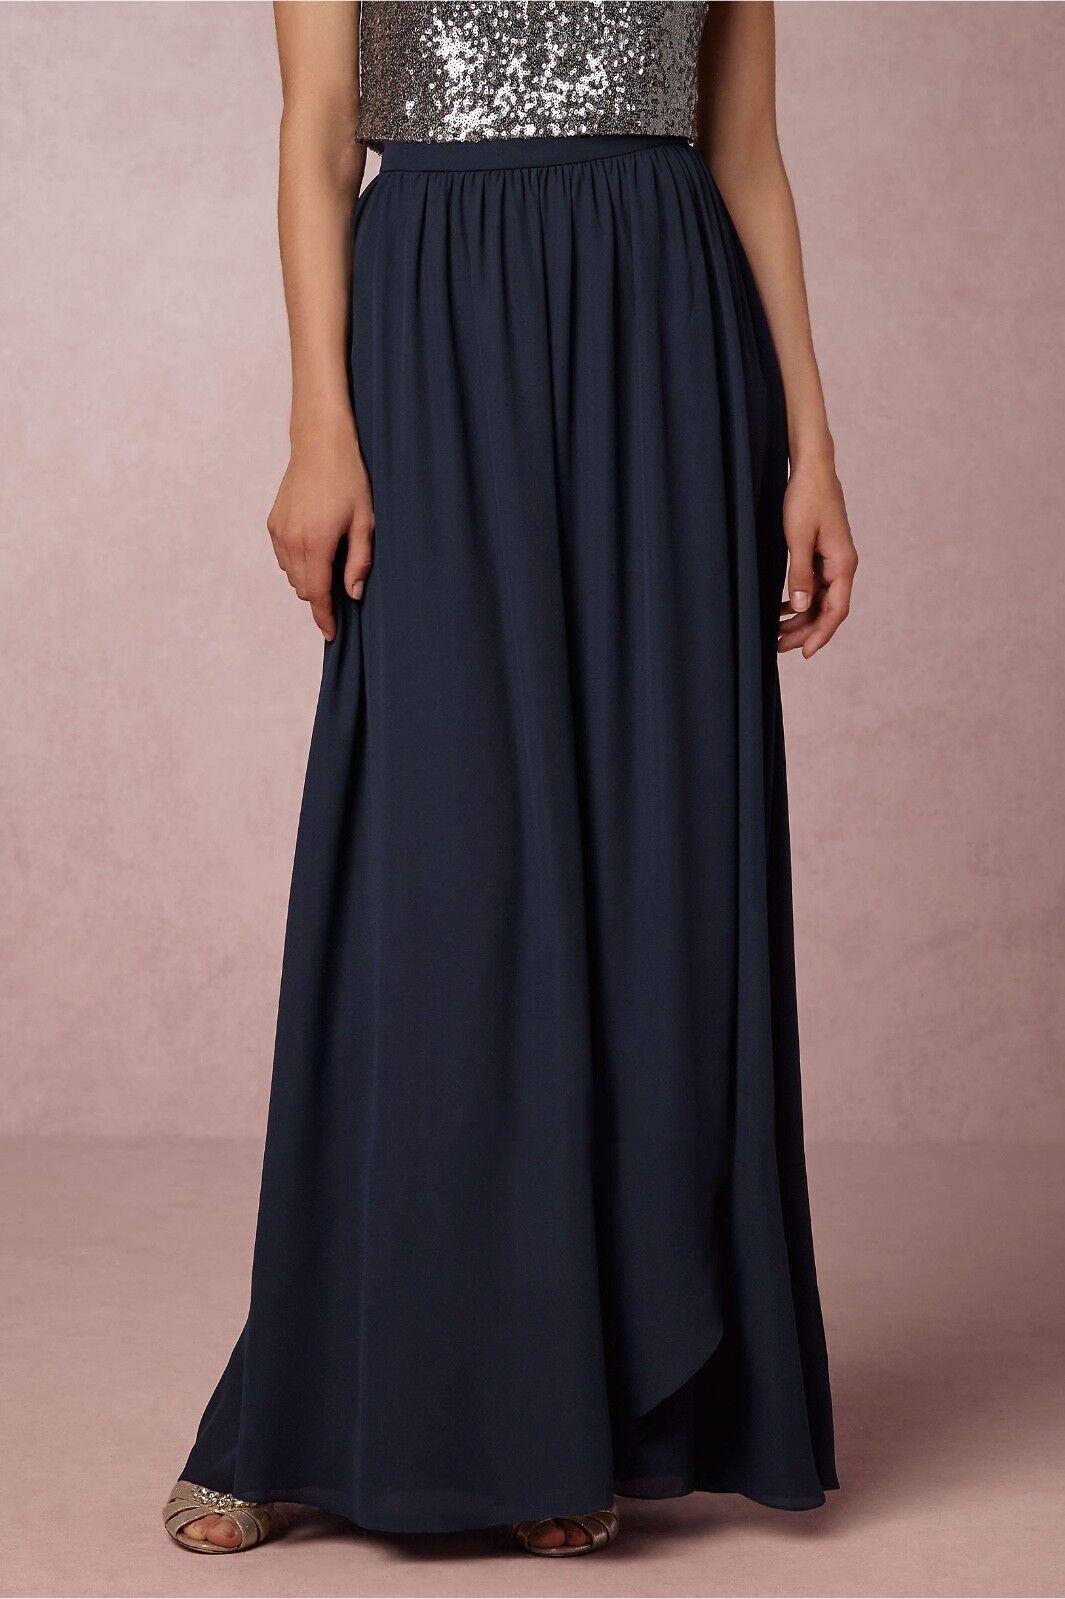 NEW Hitherto full length maxi navy Blau Jane Skirt in Bridal Party   BHLDN sz 2